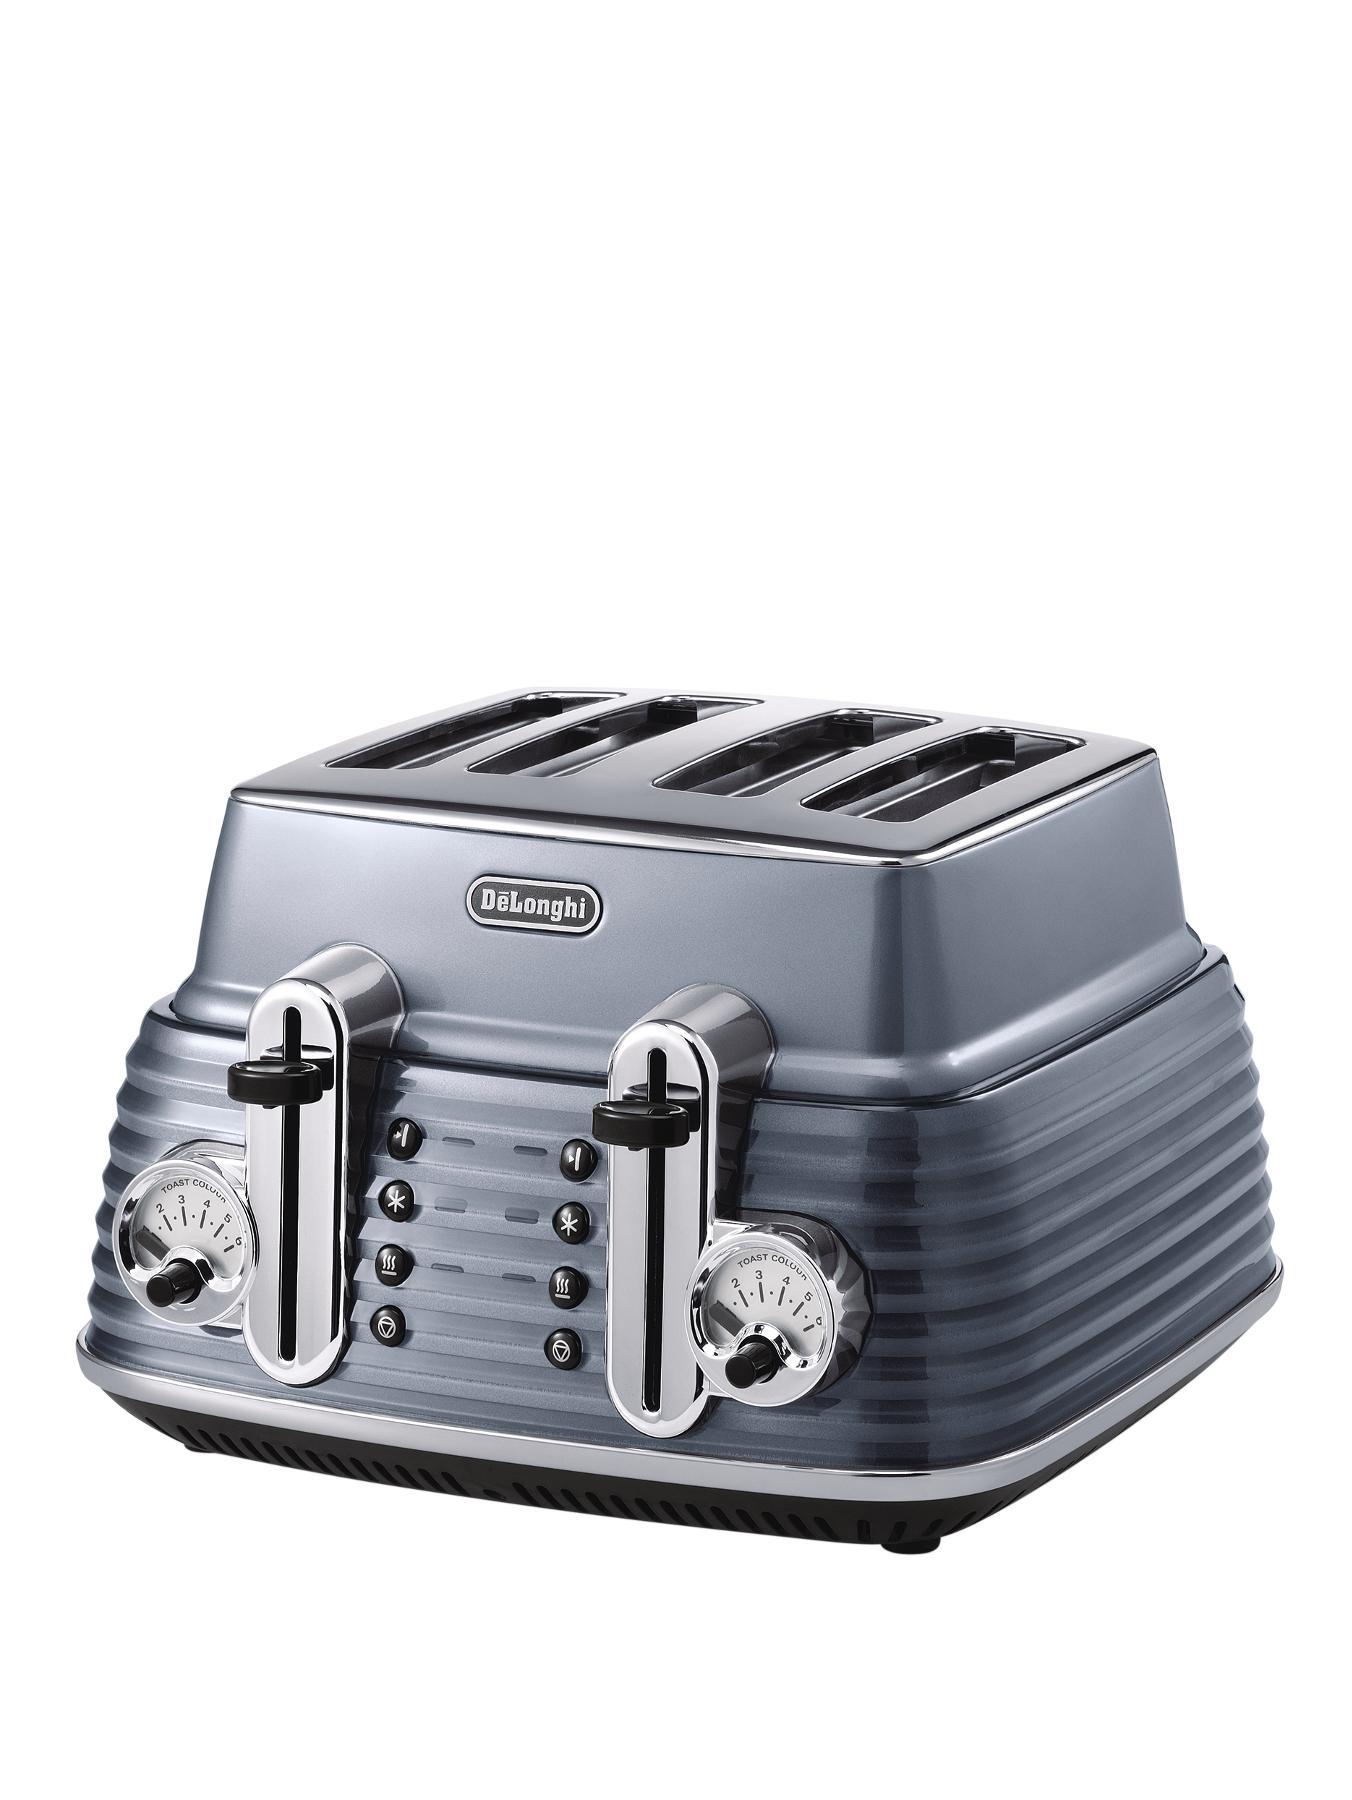 Scultura CTZ4003.GY 4 Slice Toaster - Gunmetal Grey